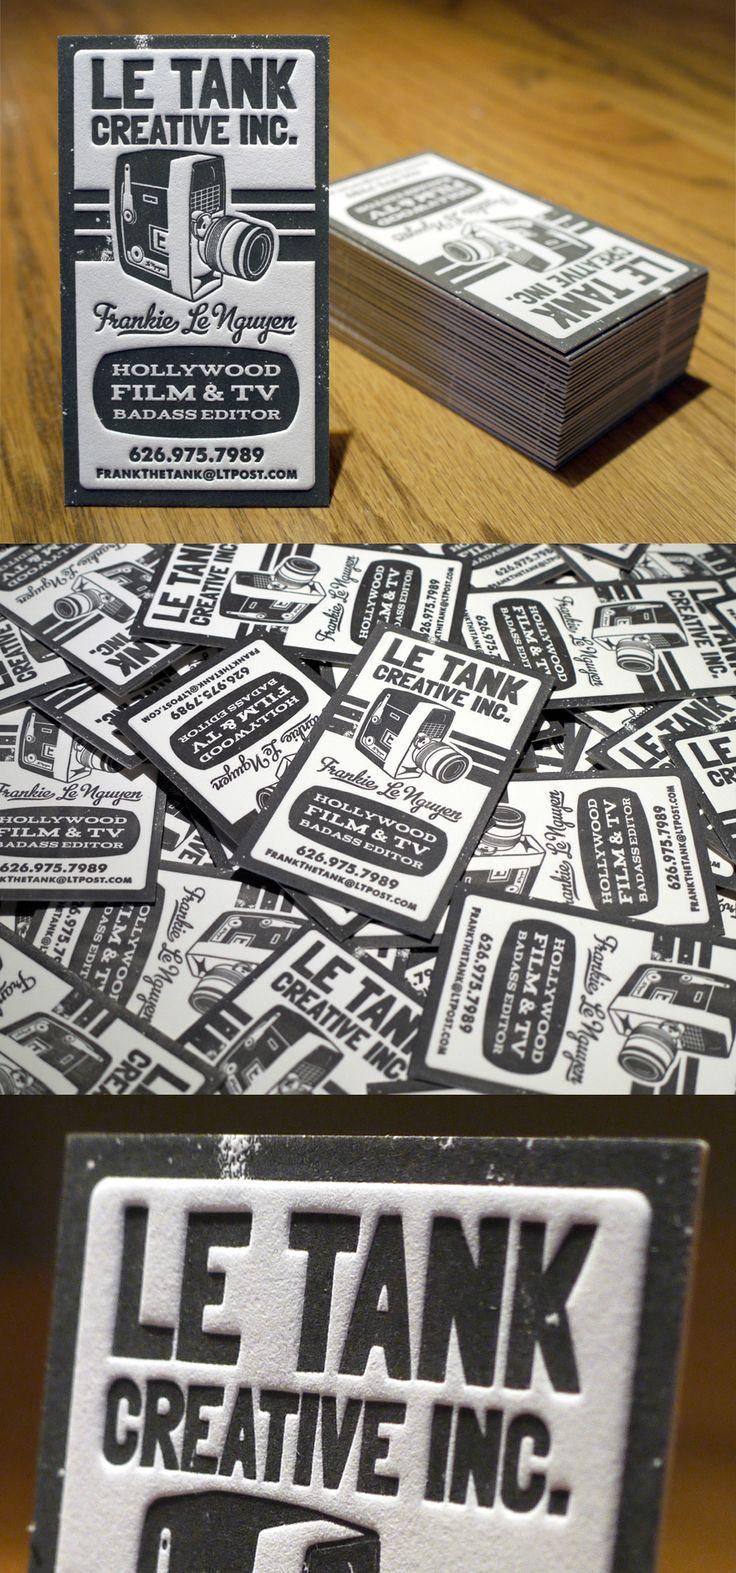 #houseofbranding | Le Tank Letterpress business cards printed on 230 lb. 100% cotton paper.